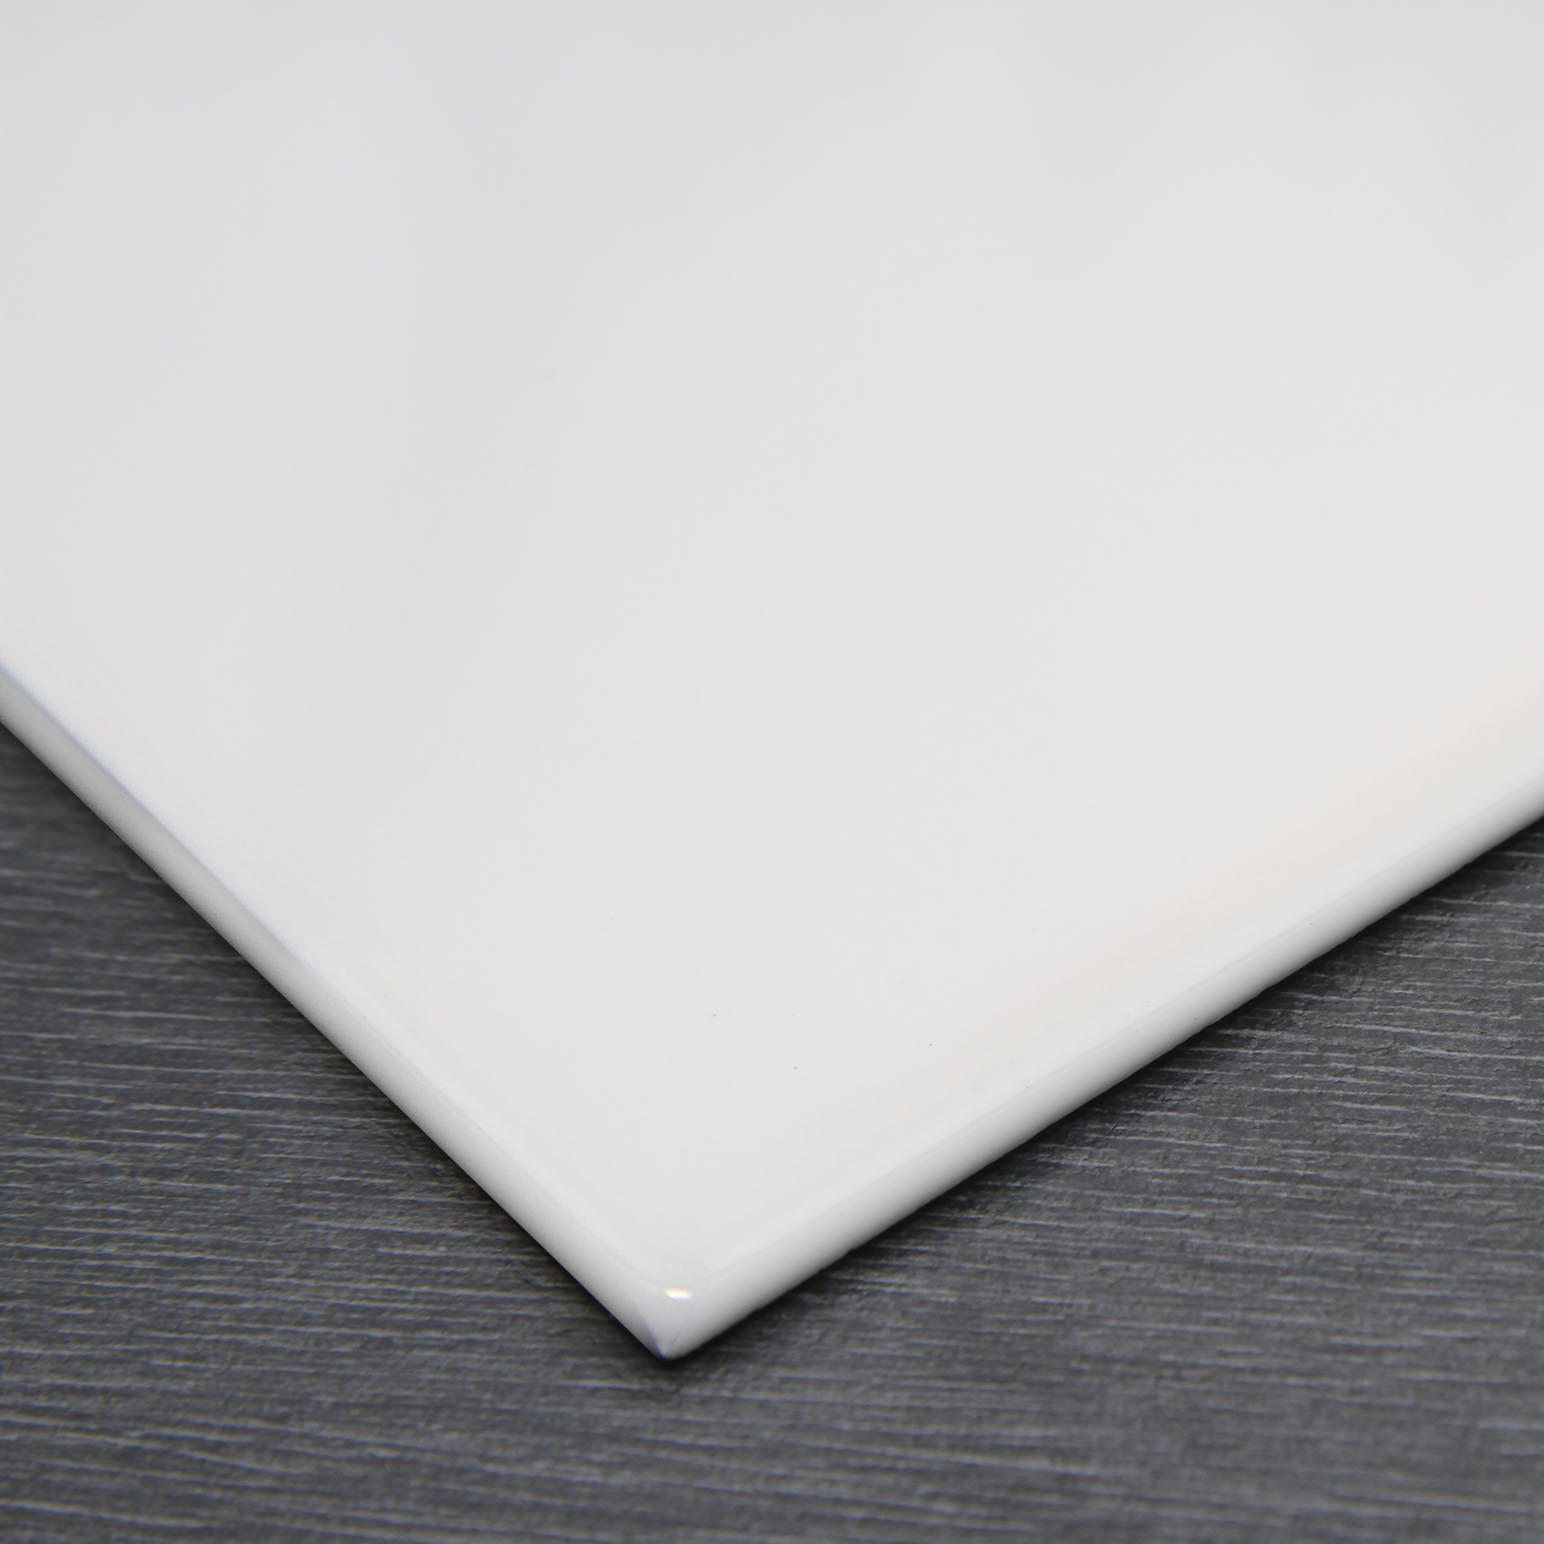 Opal white glazed ceramic gloss wall tile 152x152x55mm johnson opal white glazed ceramic gloss wall tile 152x152x55mm dailygadgetfo Gallery